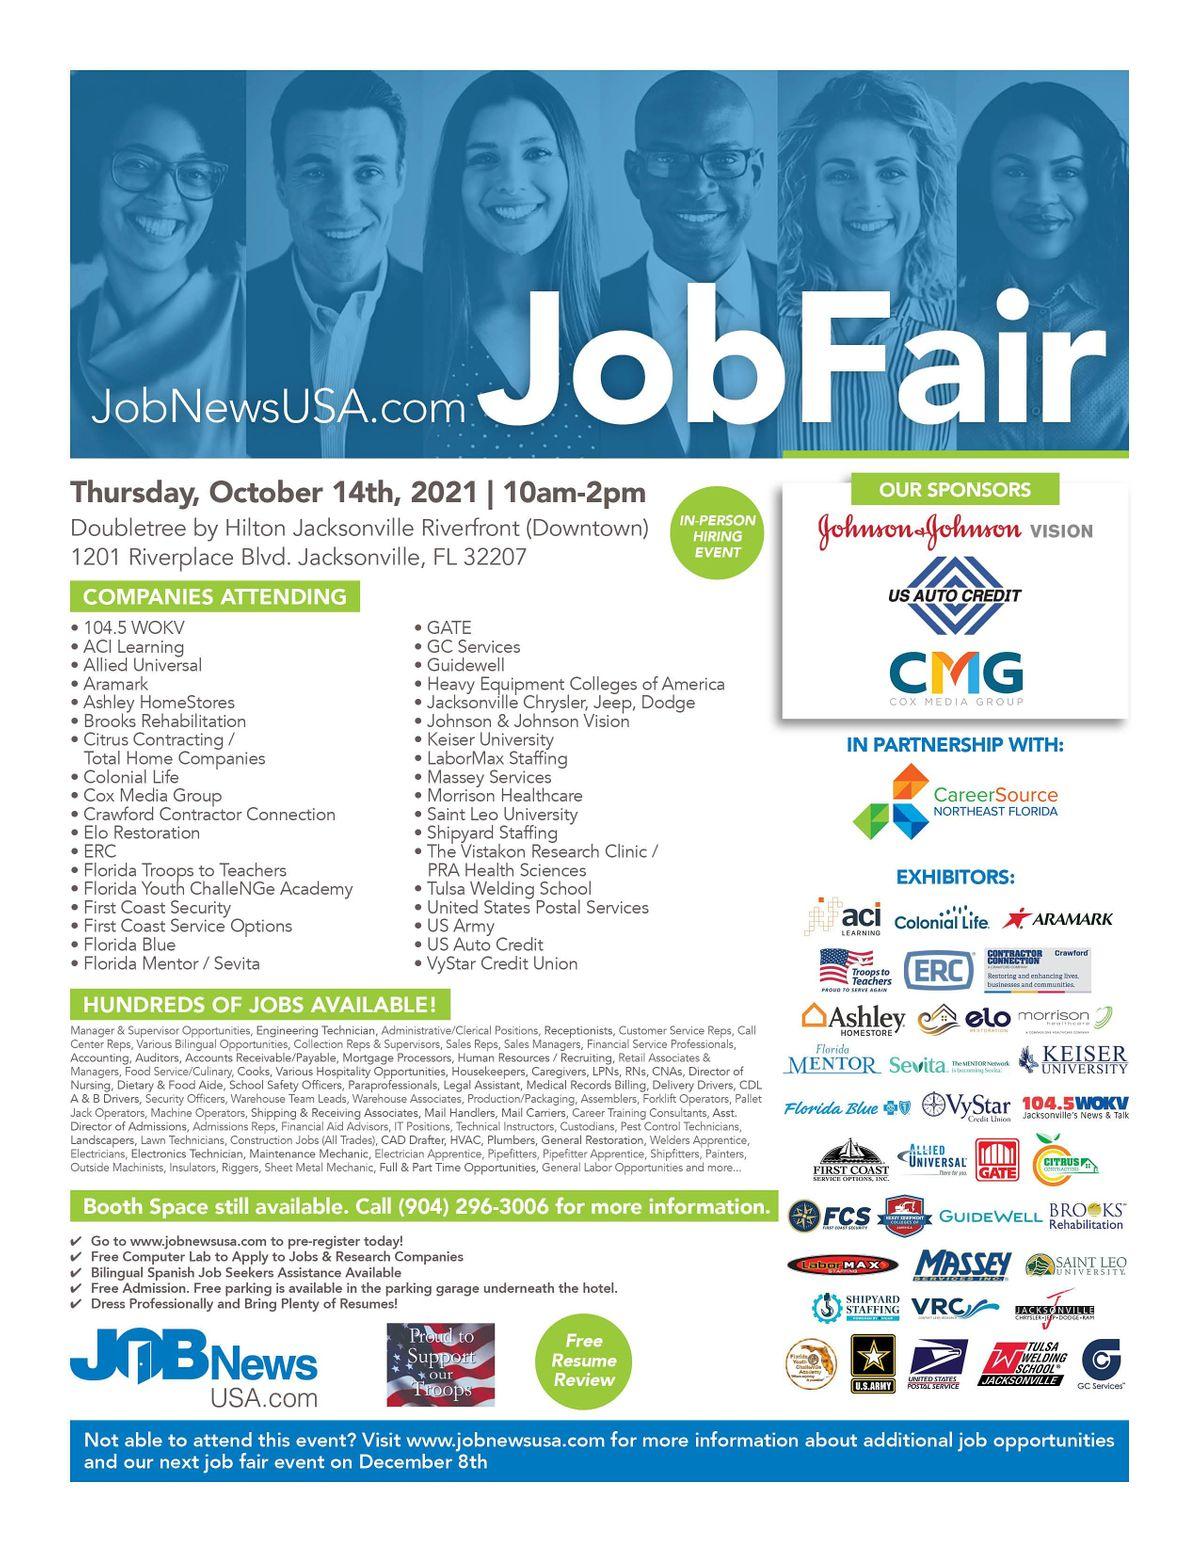 Jacksonville Job Fair - 30+ Companies Hiring for OVER 1,000 JOBS